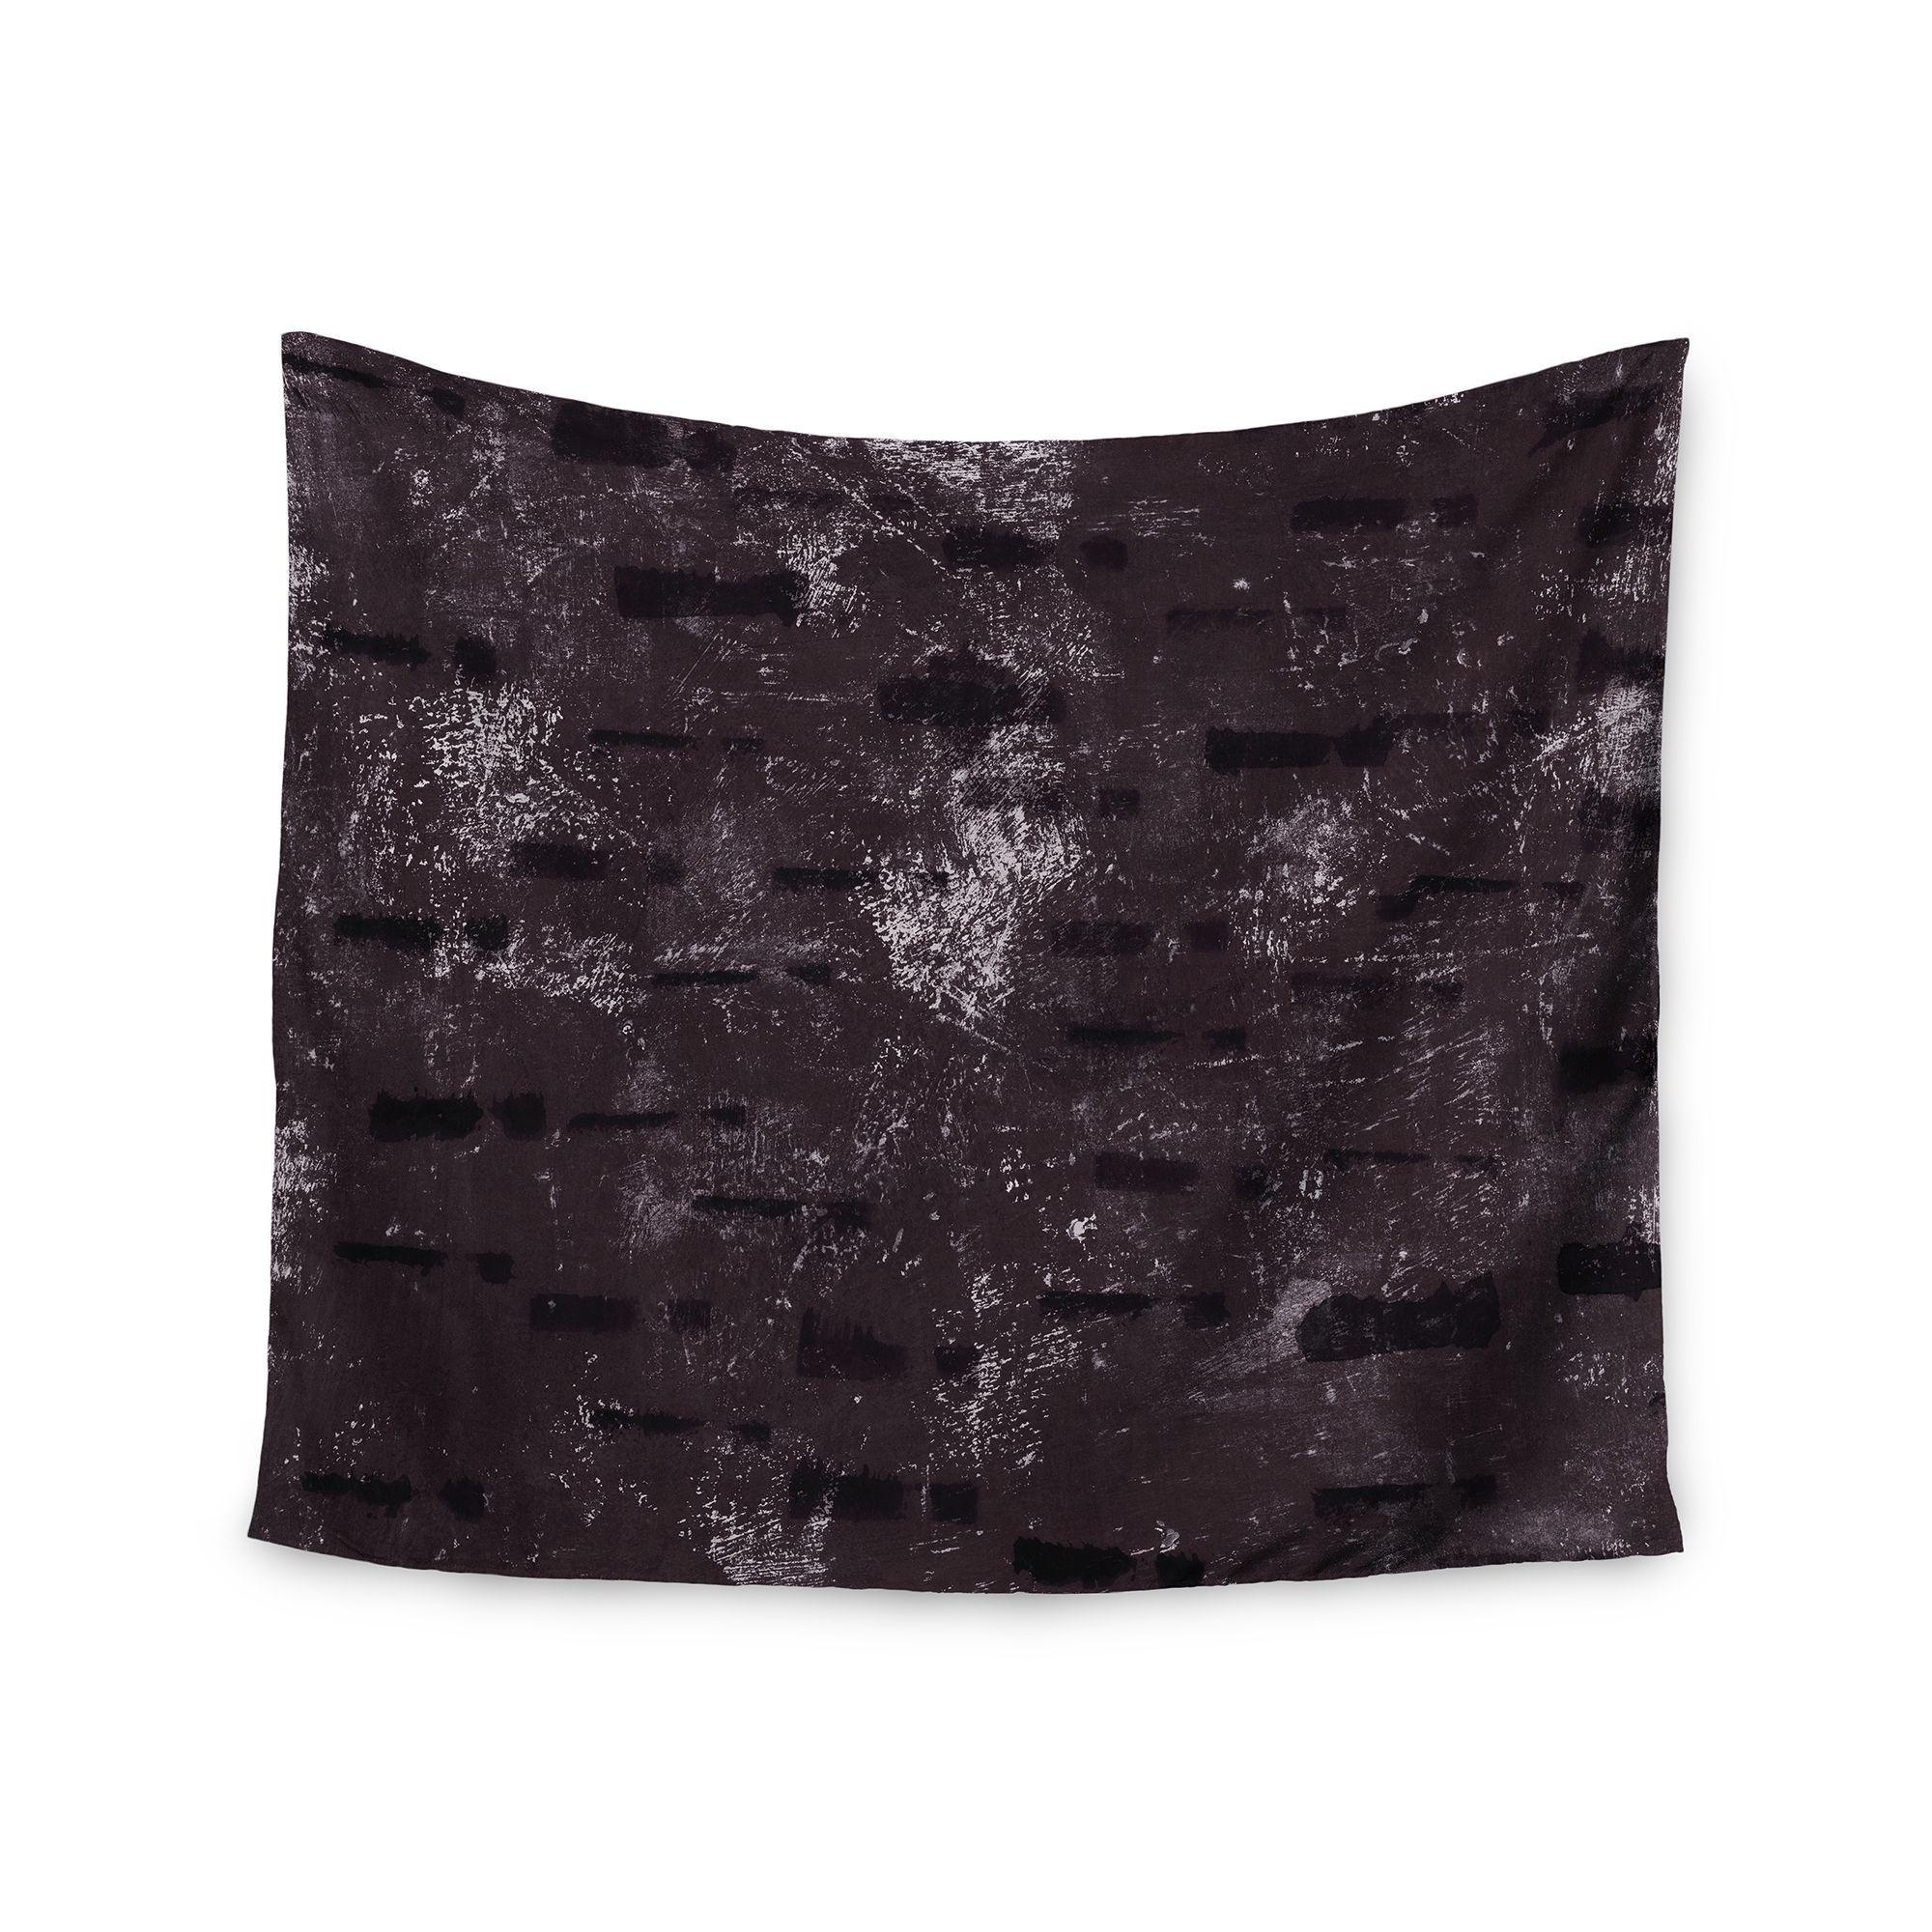 Kess InHouse Iris Lehnhardt 'Tex Mix Lounge' Abstract 51x60-inch Tapestry